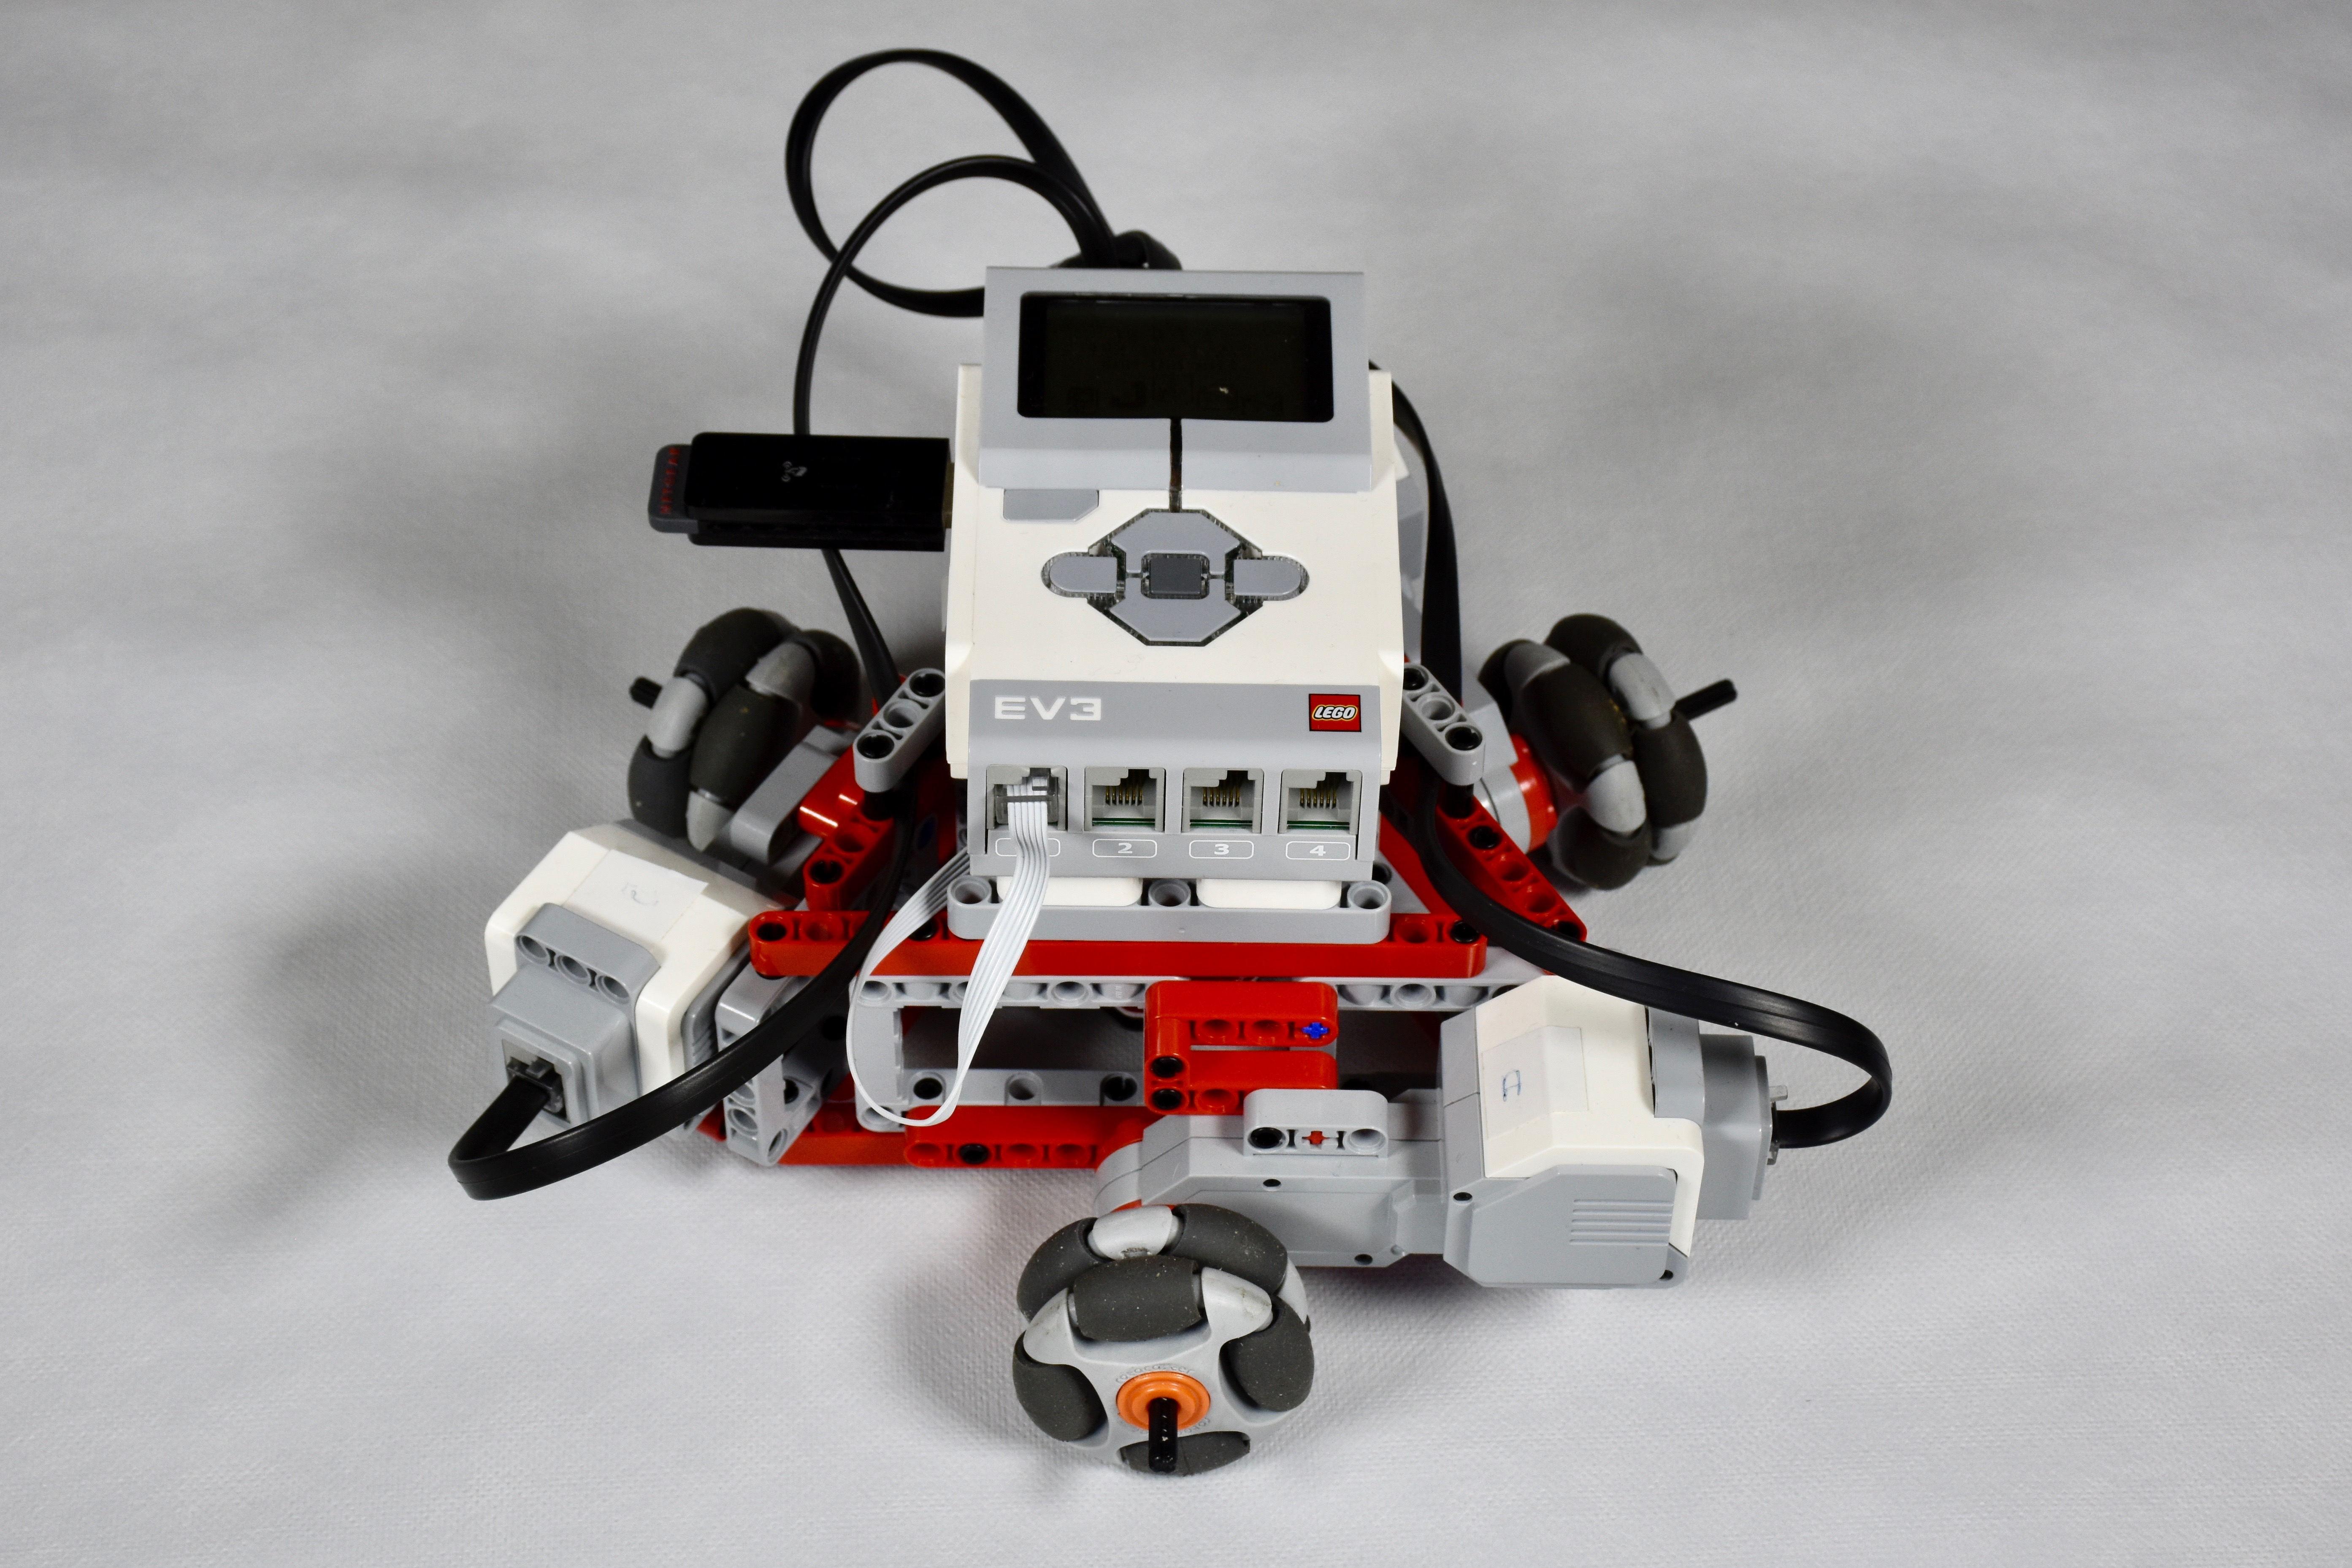 Holonomic LEGO Mindstorms Robot   Christoph Bartneck, Ph D